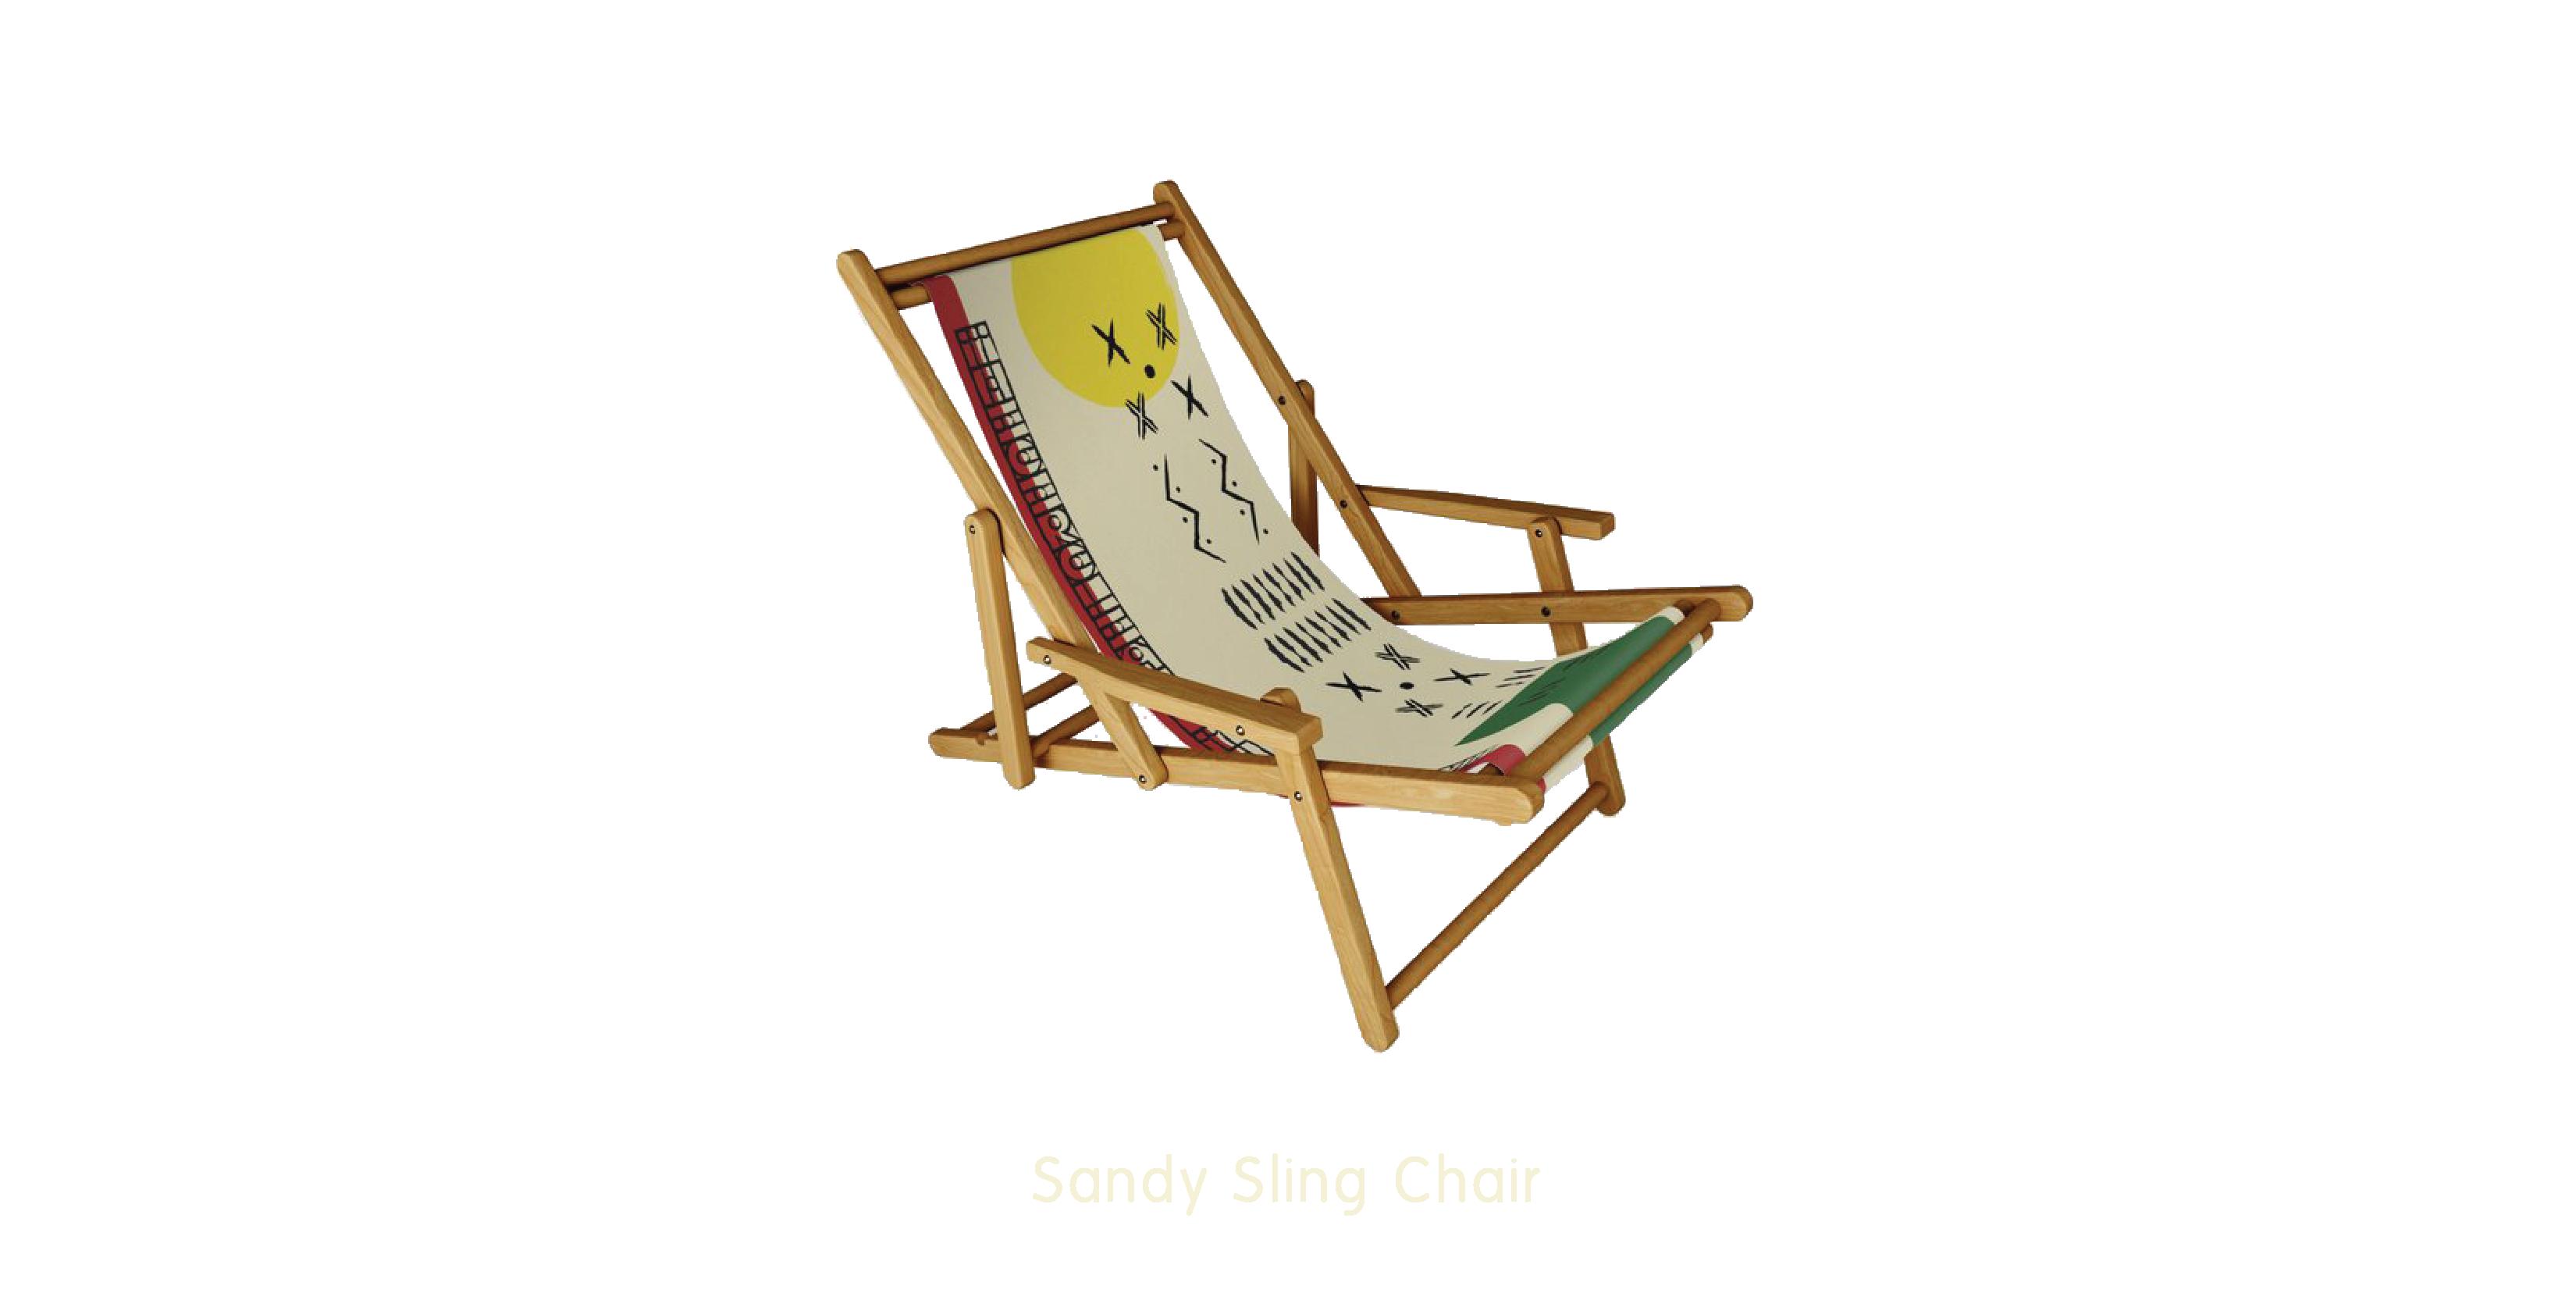 Sandy Sling Chair